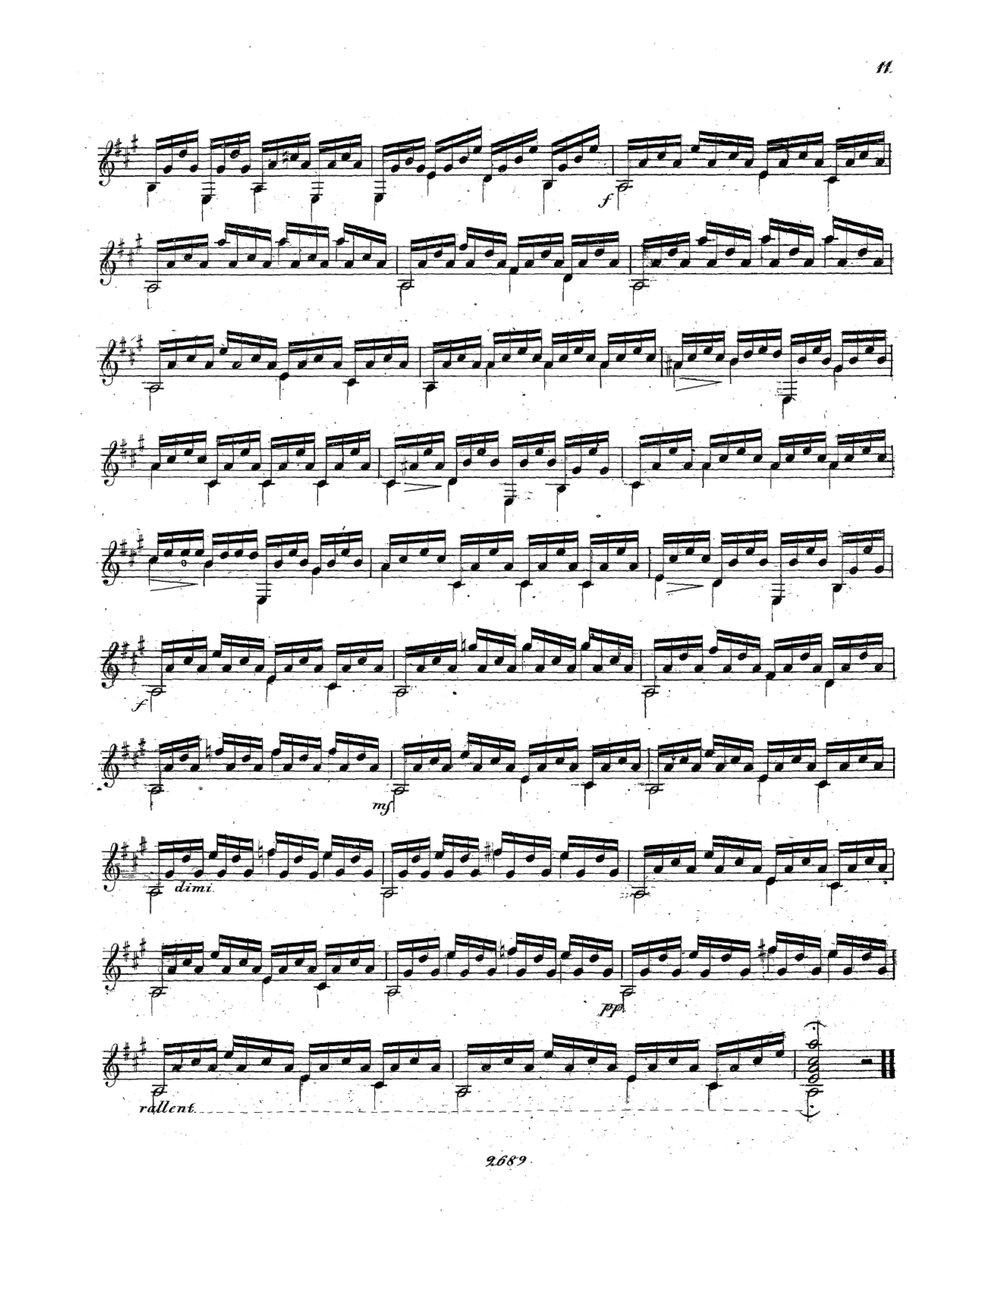 6 Caprices, Op.26 (Carcassi, Matteo) 10.jpg